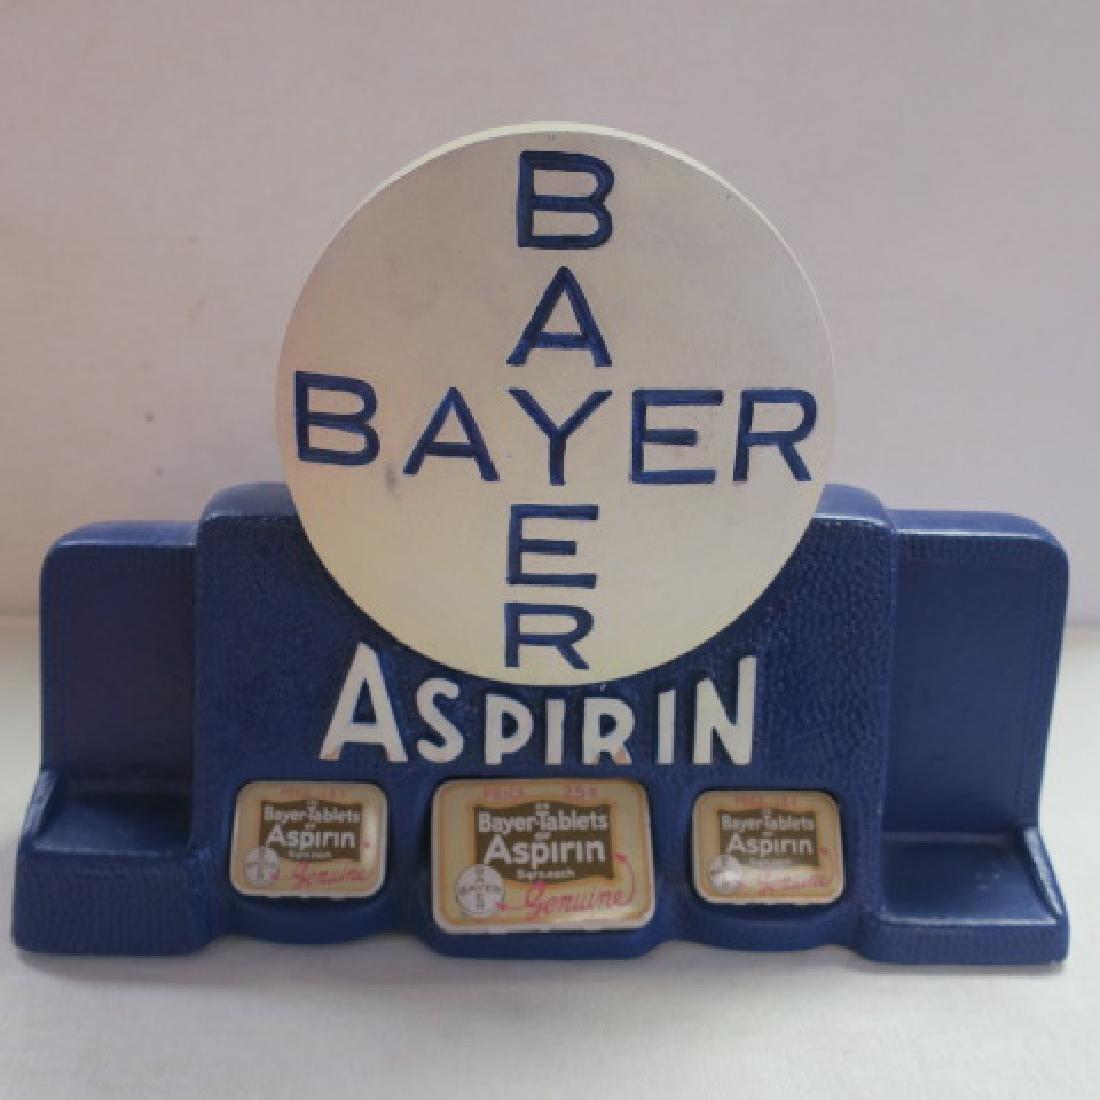 BAYER ASPIRIN Tablets Tin Counter Display: